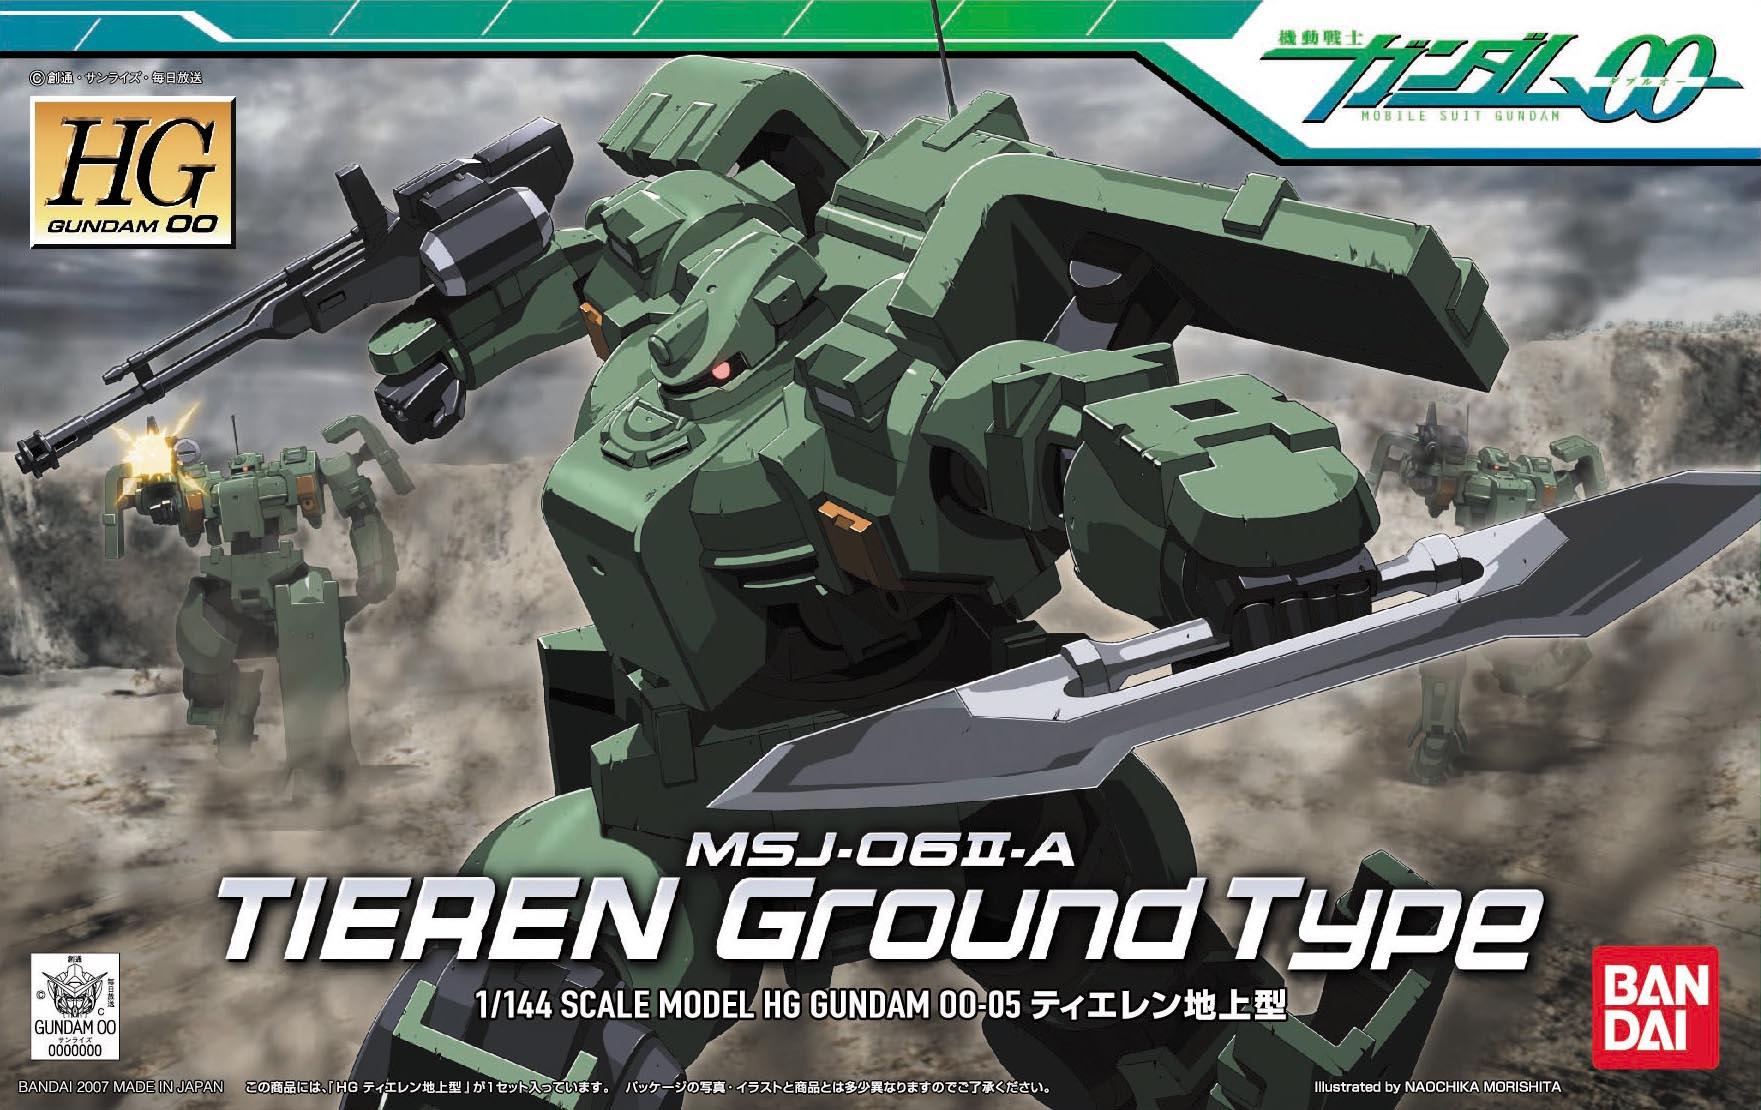 HG 1/144 MSJ-06II-A ティエレン地上型 [Tieren Ground Type] パッケージアート